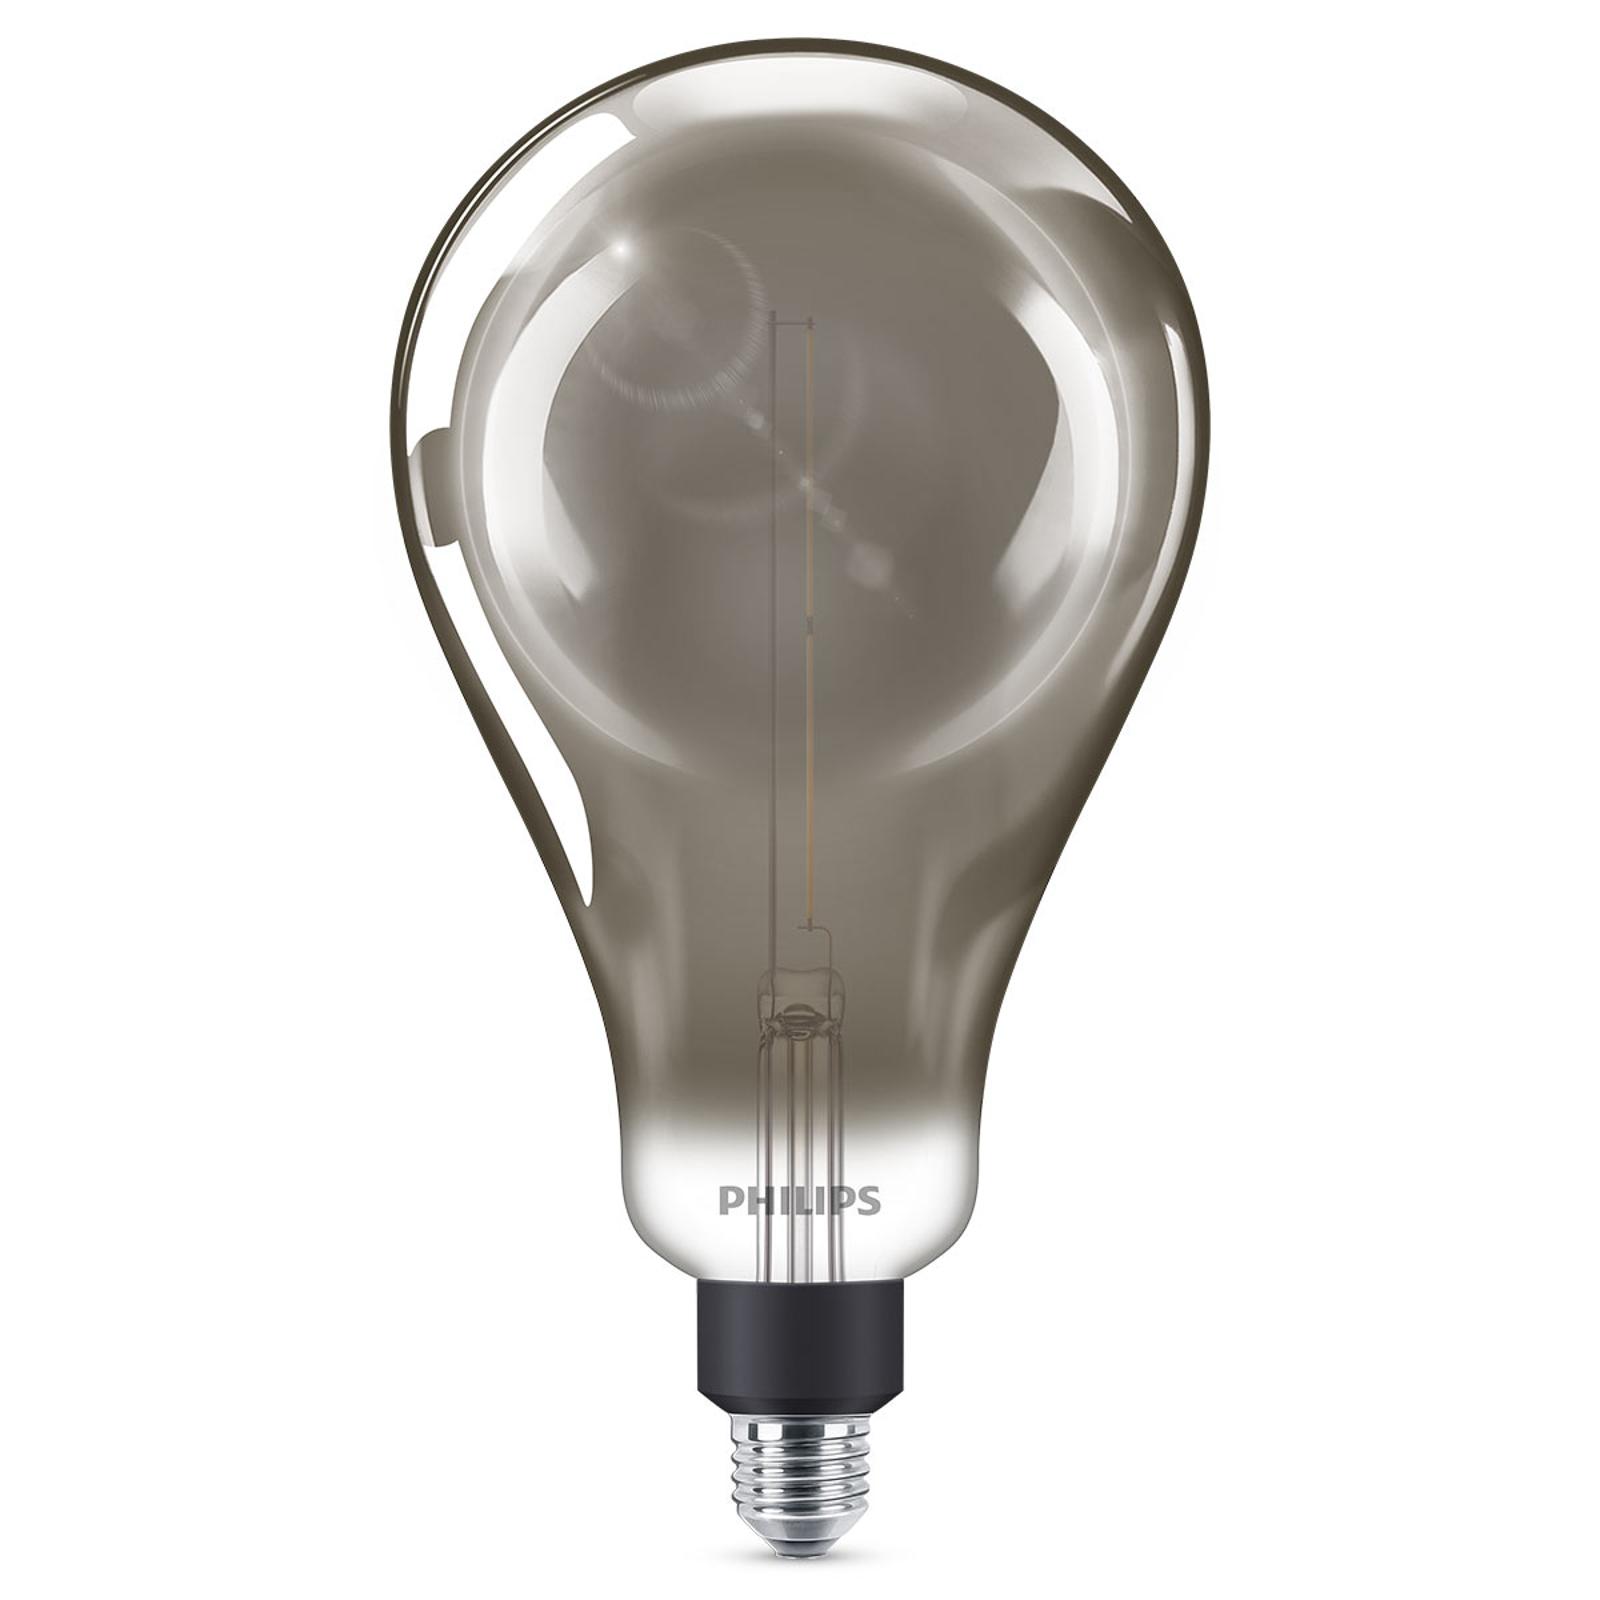 Philips E27 Giant LED-Lampe 6,5W dimmb. smoky